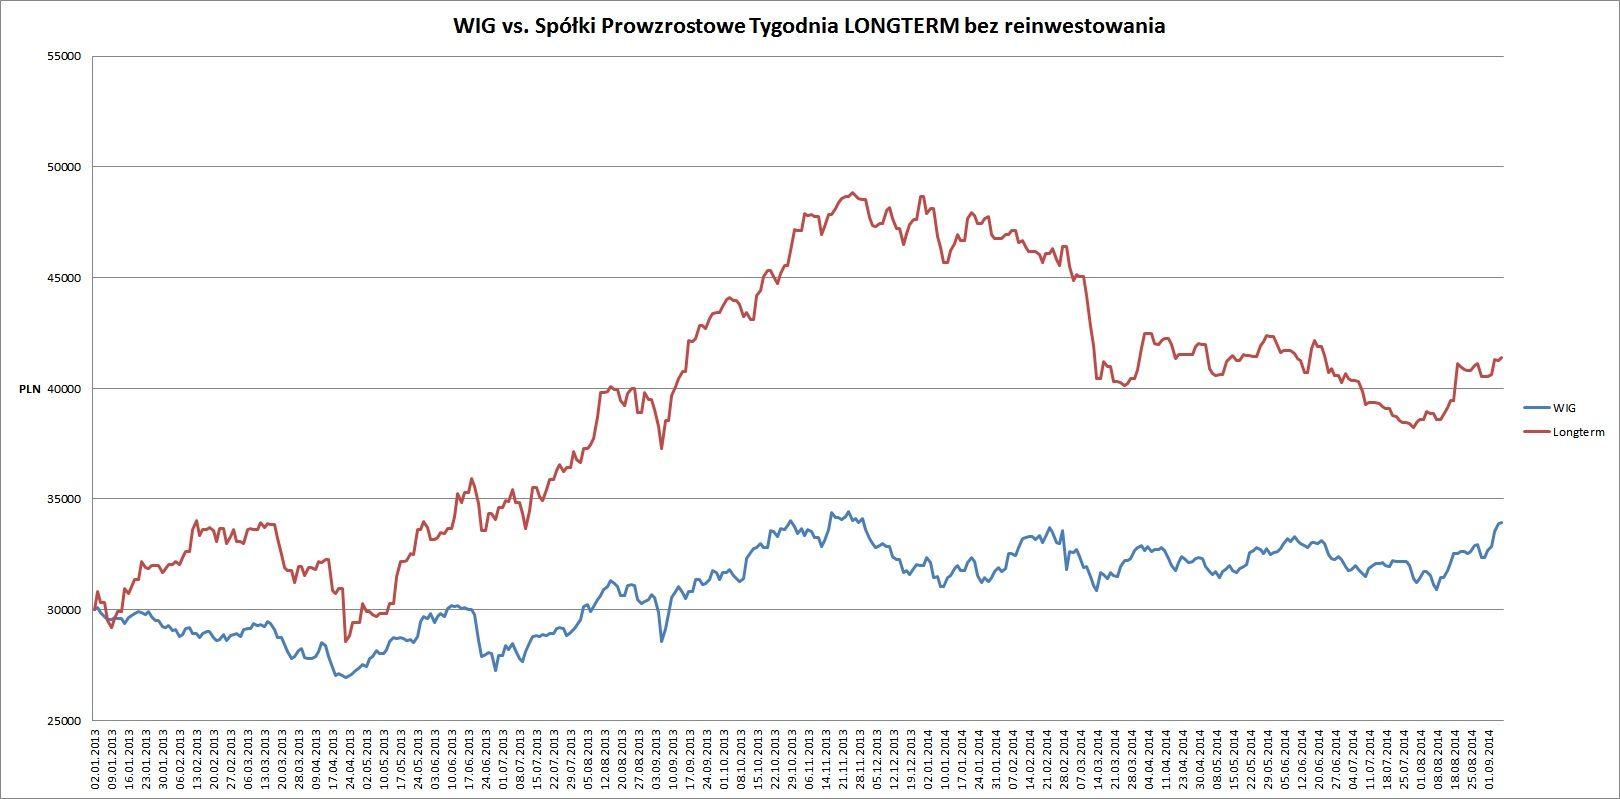 wig vs long od pocz. 2013